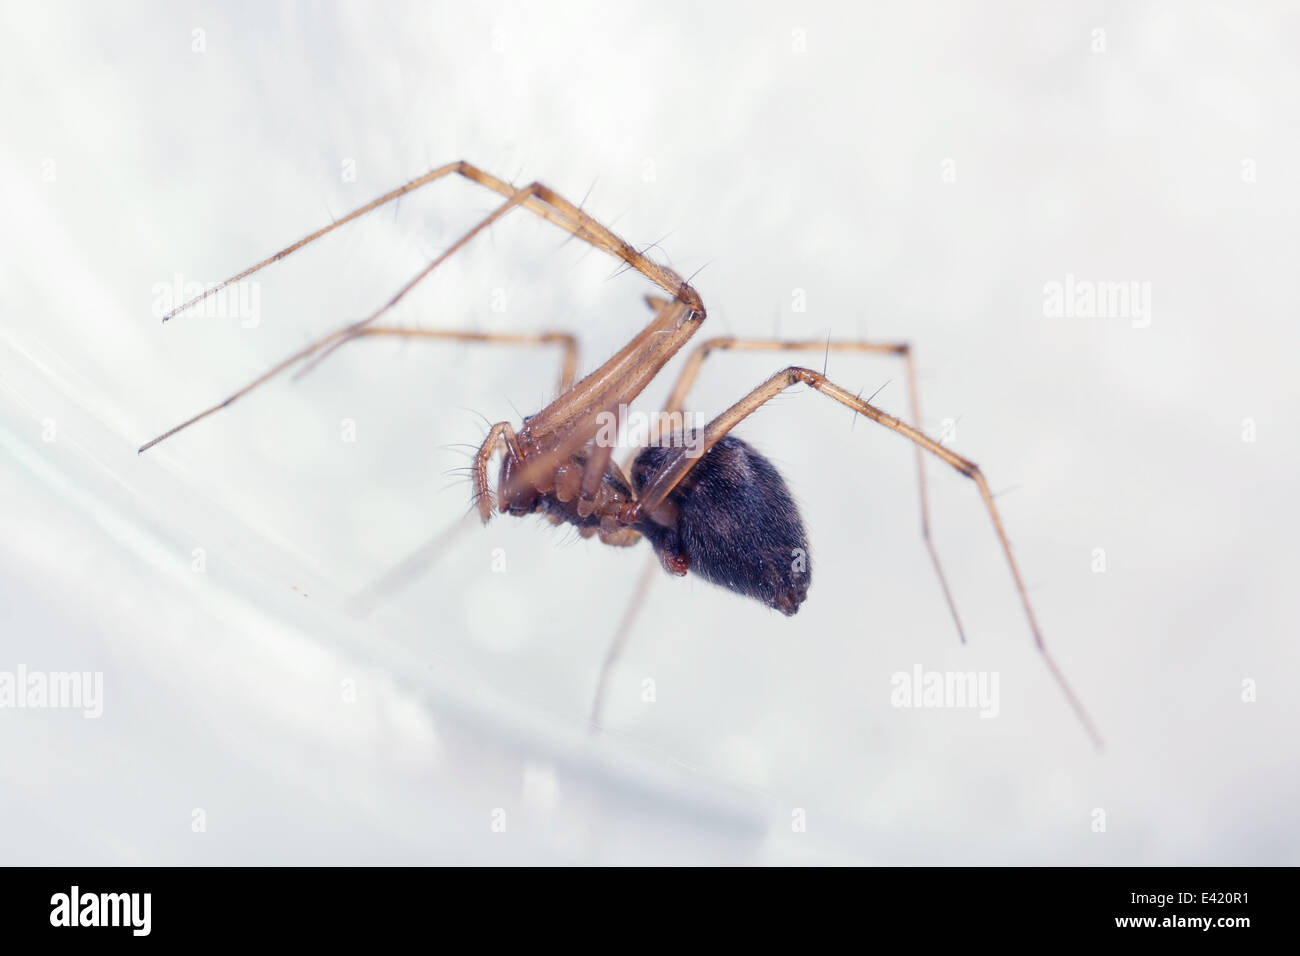 Female Misty ground-weaver (Megalepthyphantes nebulosus) spider, part of the family Linyphiidae - Sheetweb weavers. Stock Photo